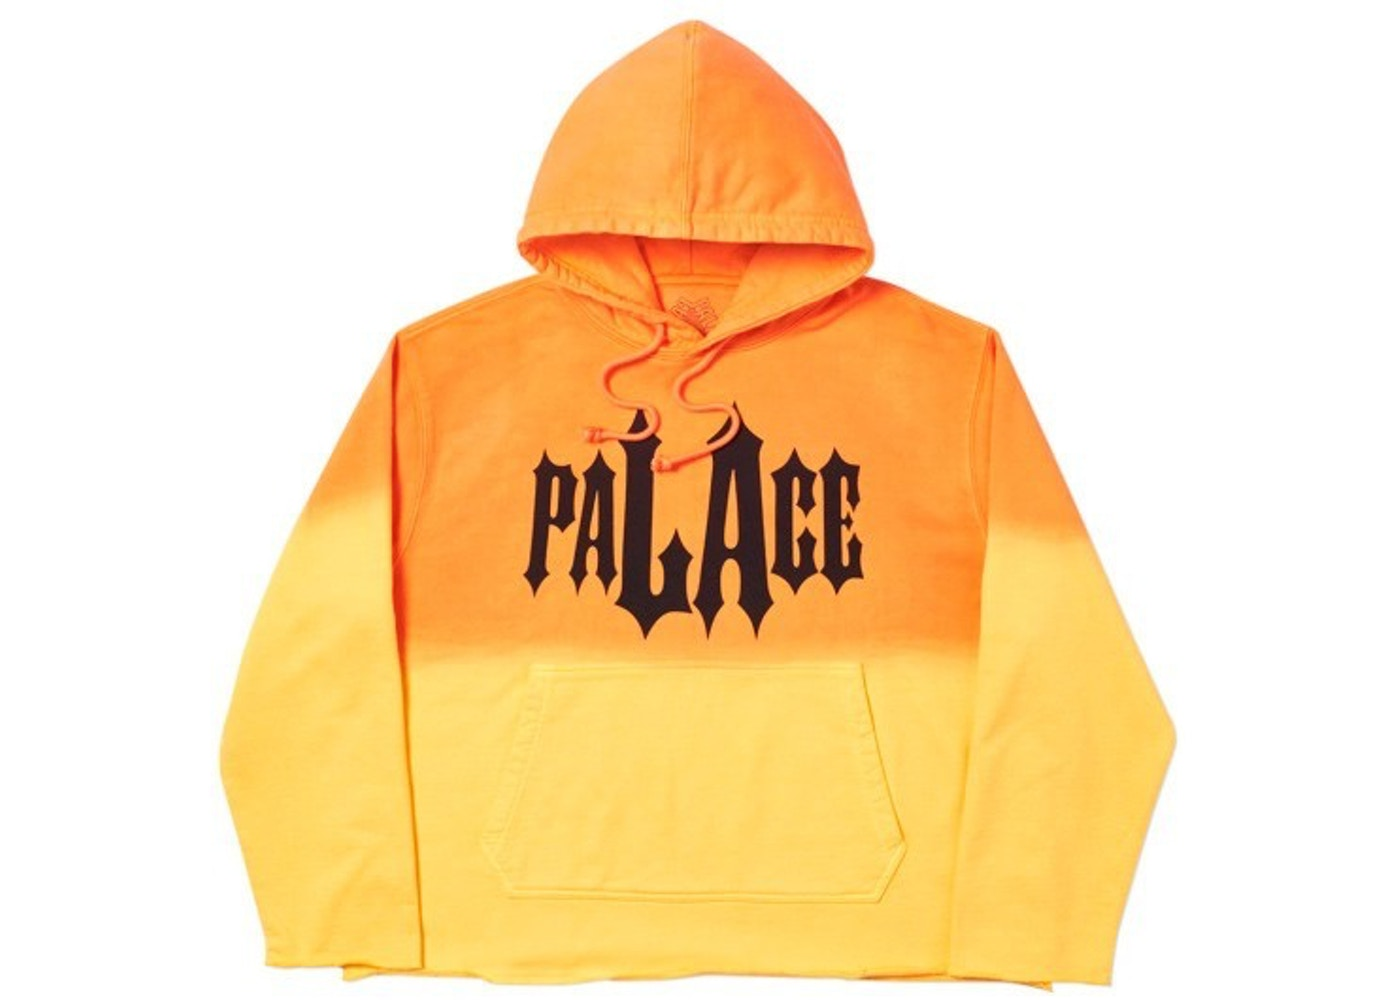 7947cd26 Palace LA Dye Hood Orange - SS19